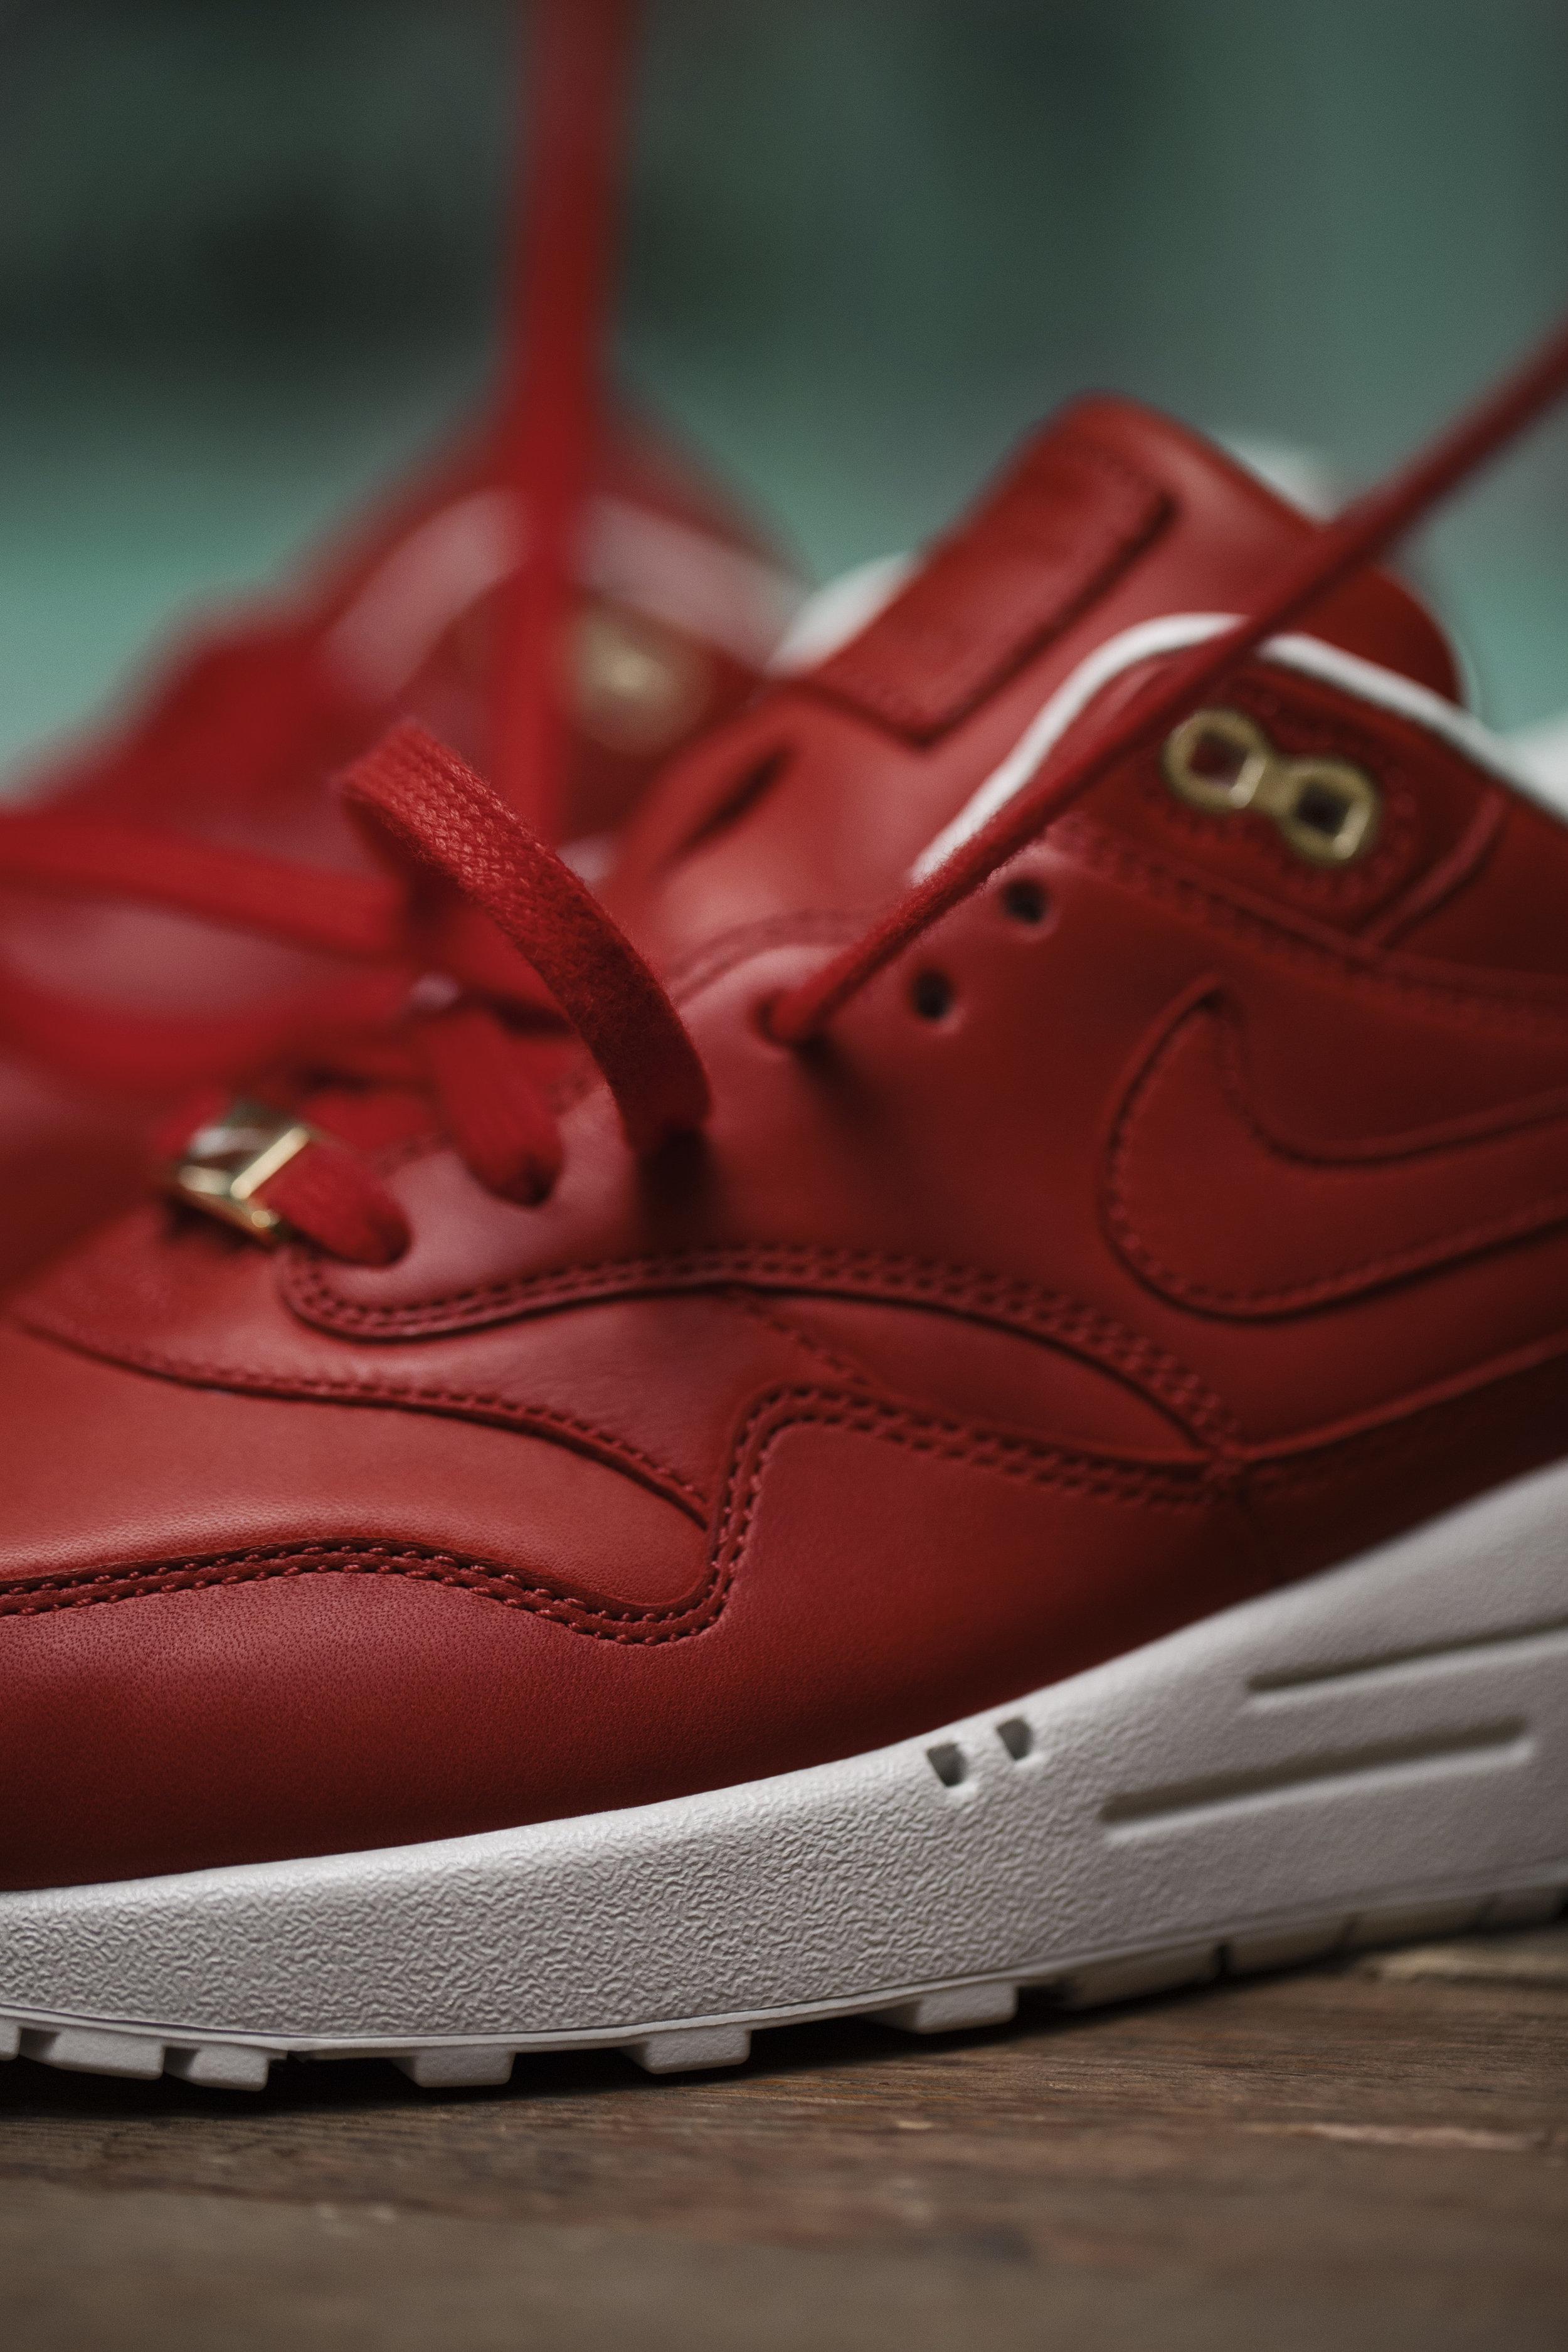 SP17_Nike_ID_AM1_Leather_Shoot_211.jpg